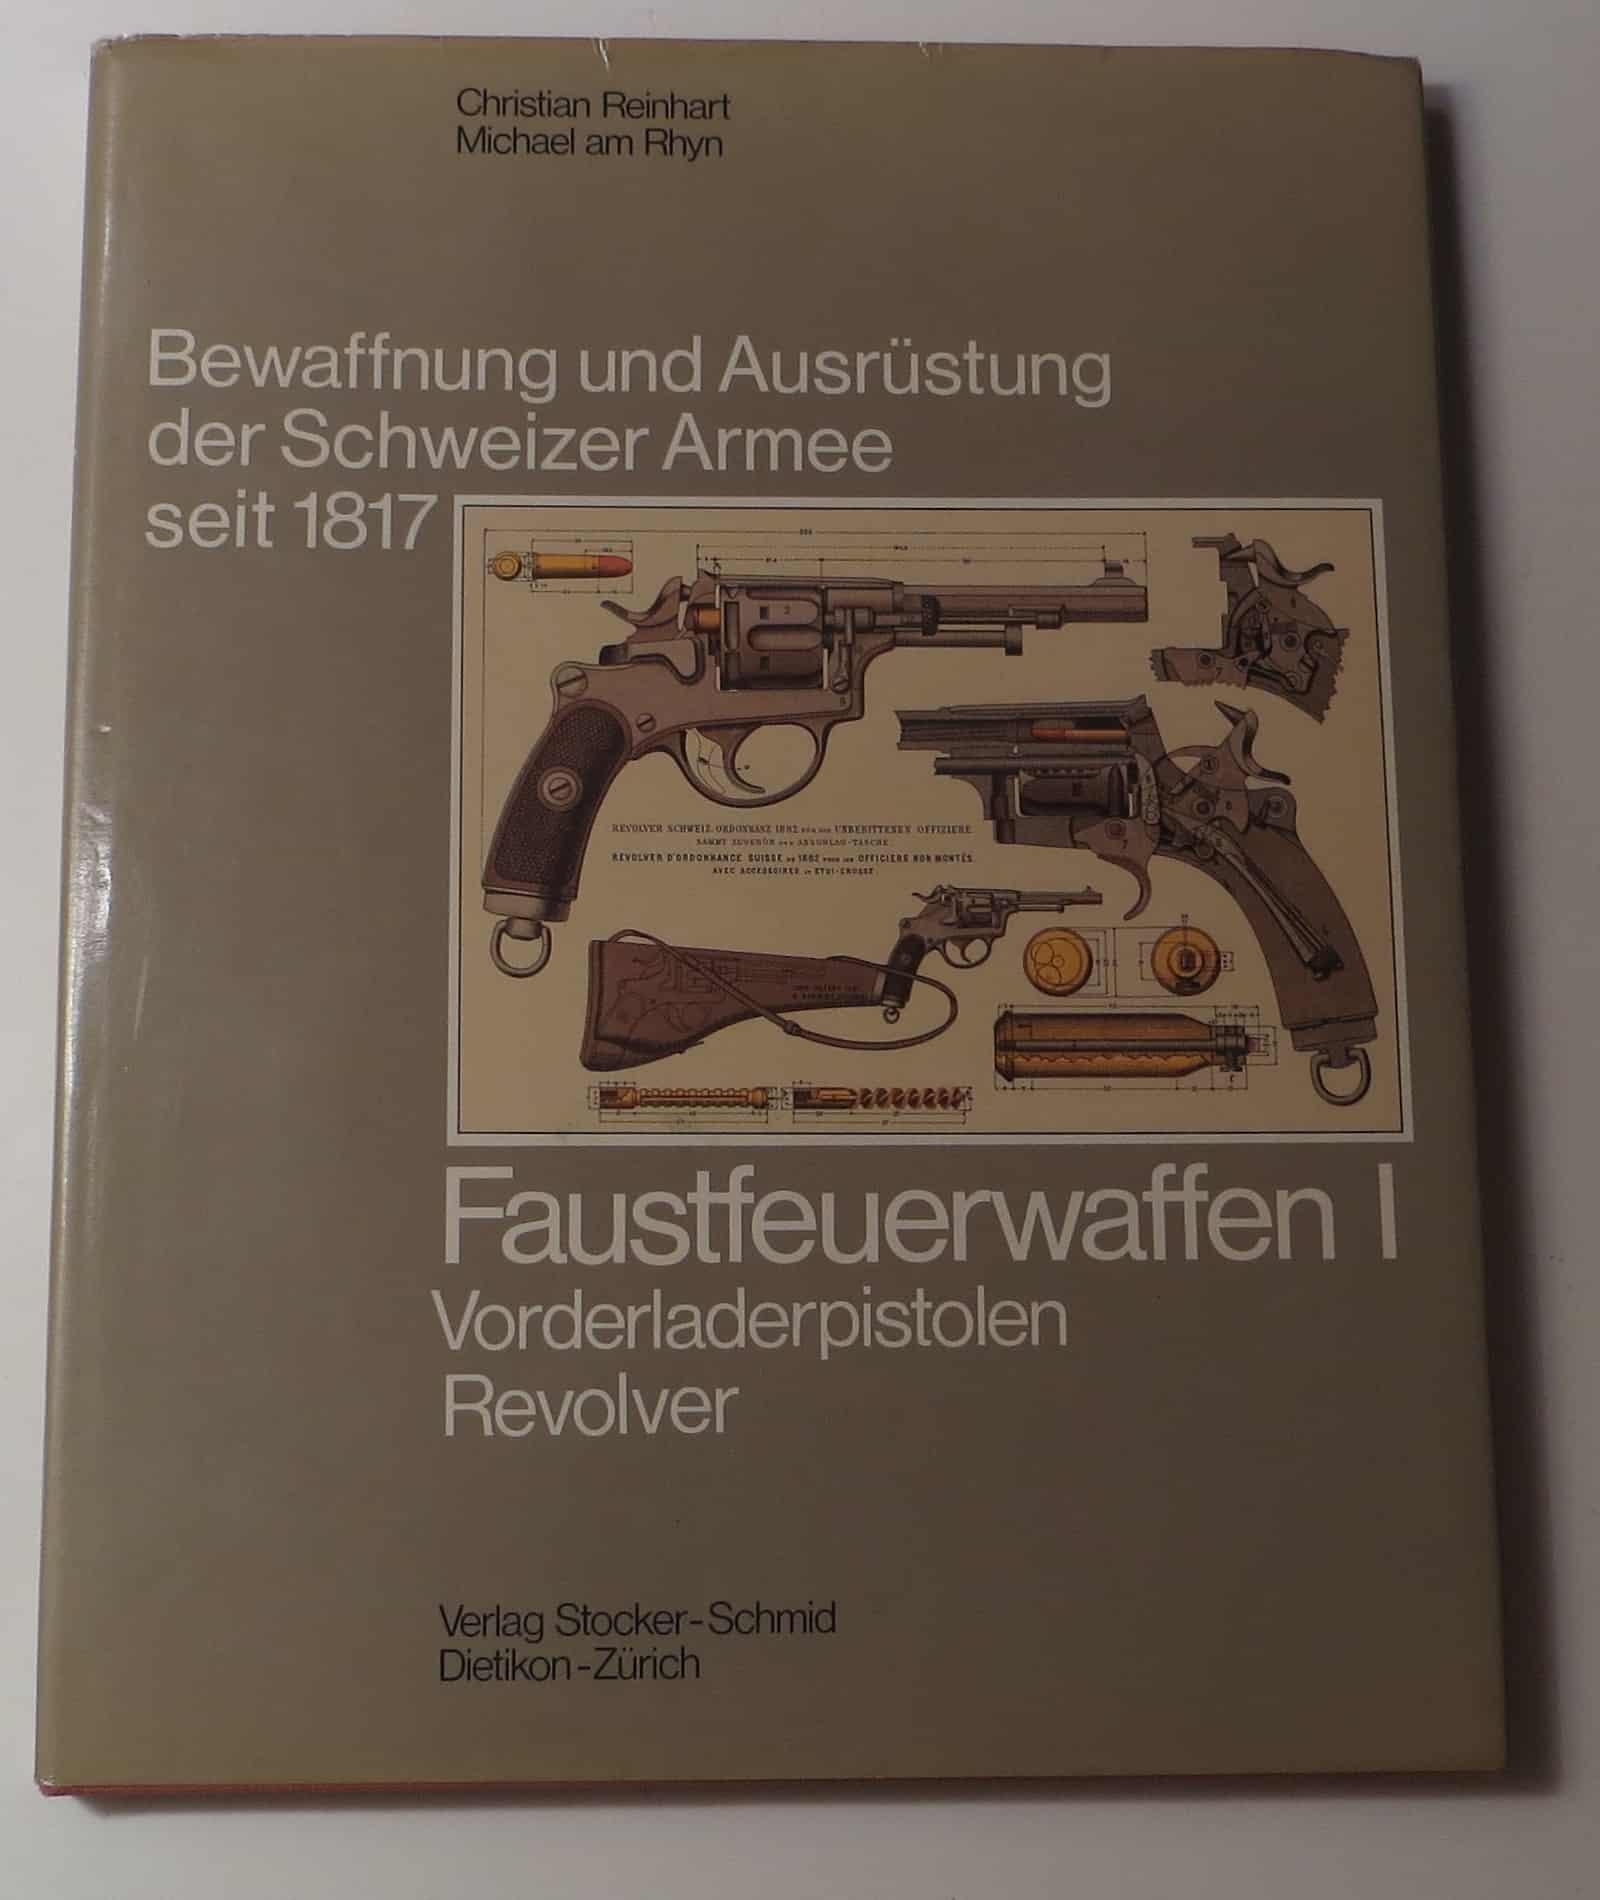 Faustfeuerwaffen I